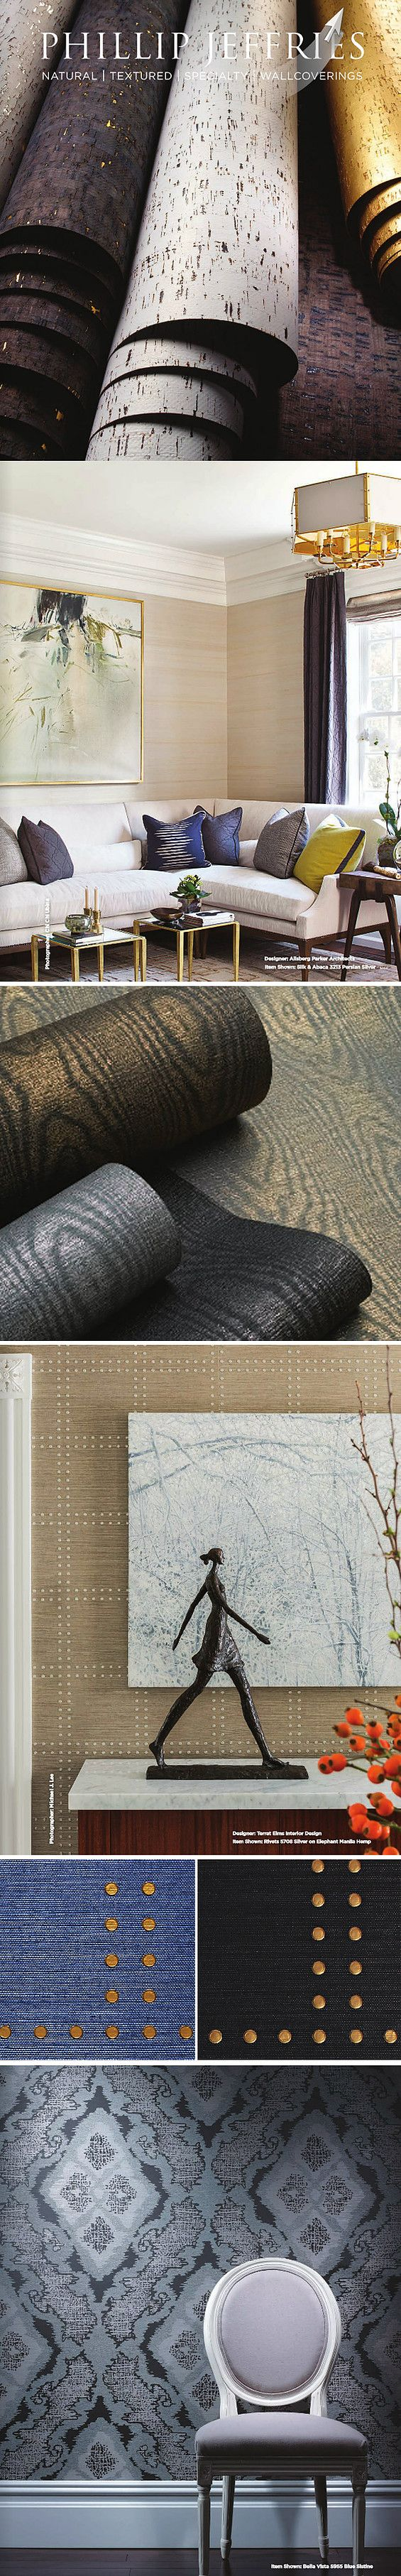 Atelier du Petit Colin - Philip Jeffrie's Luxury Wallpaper Wallcovering